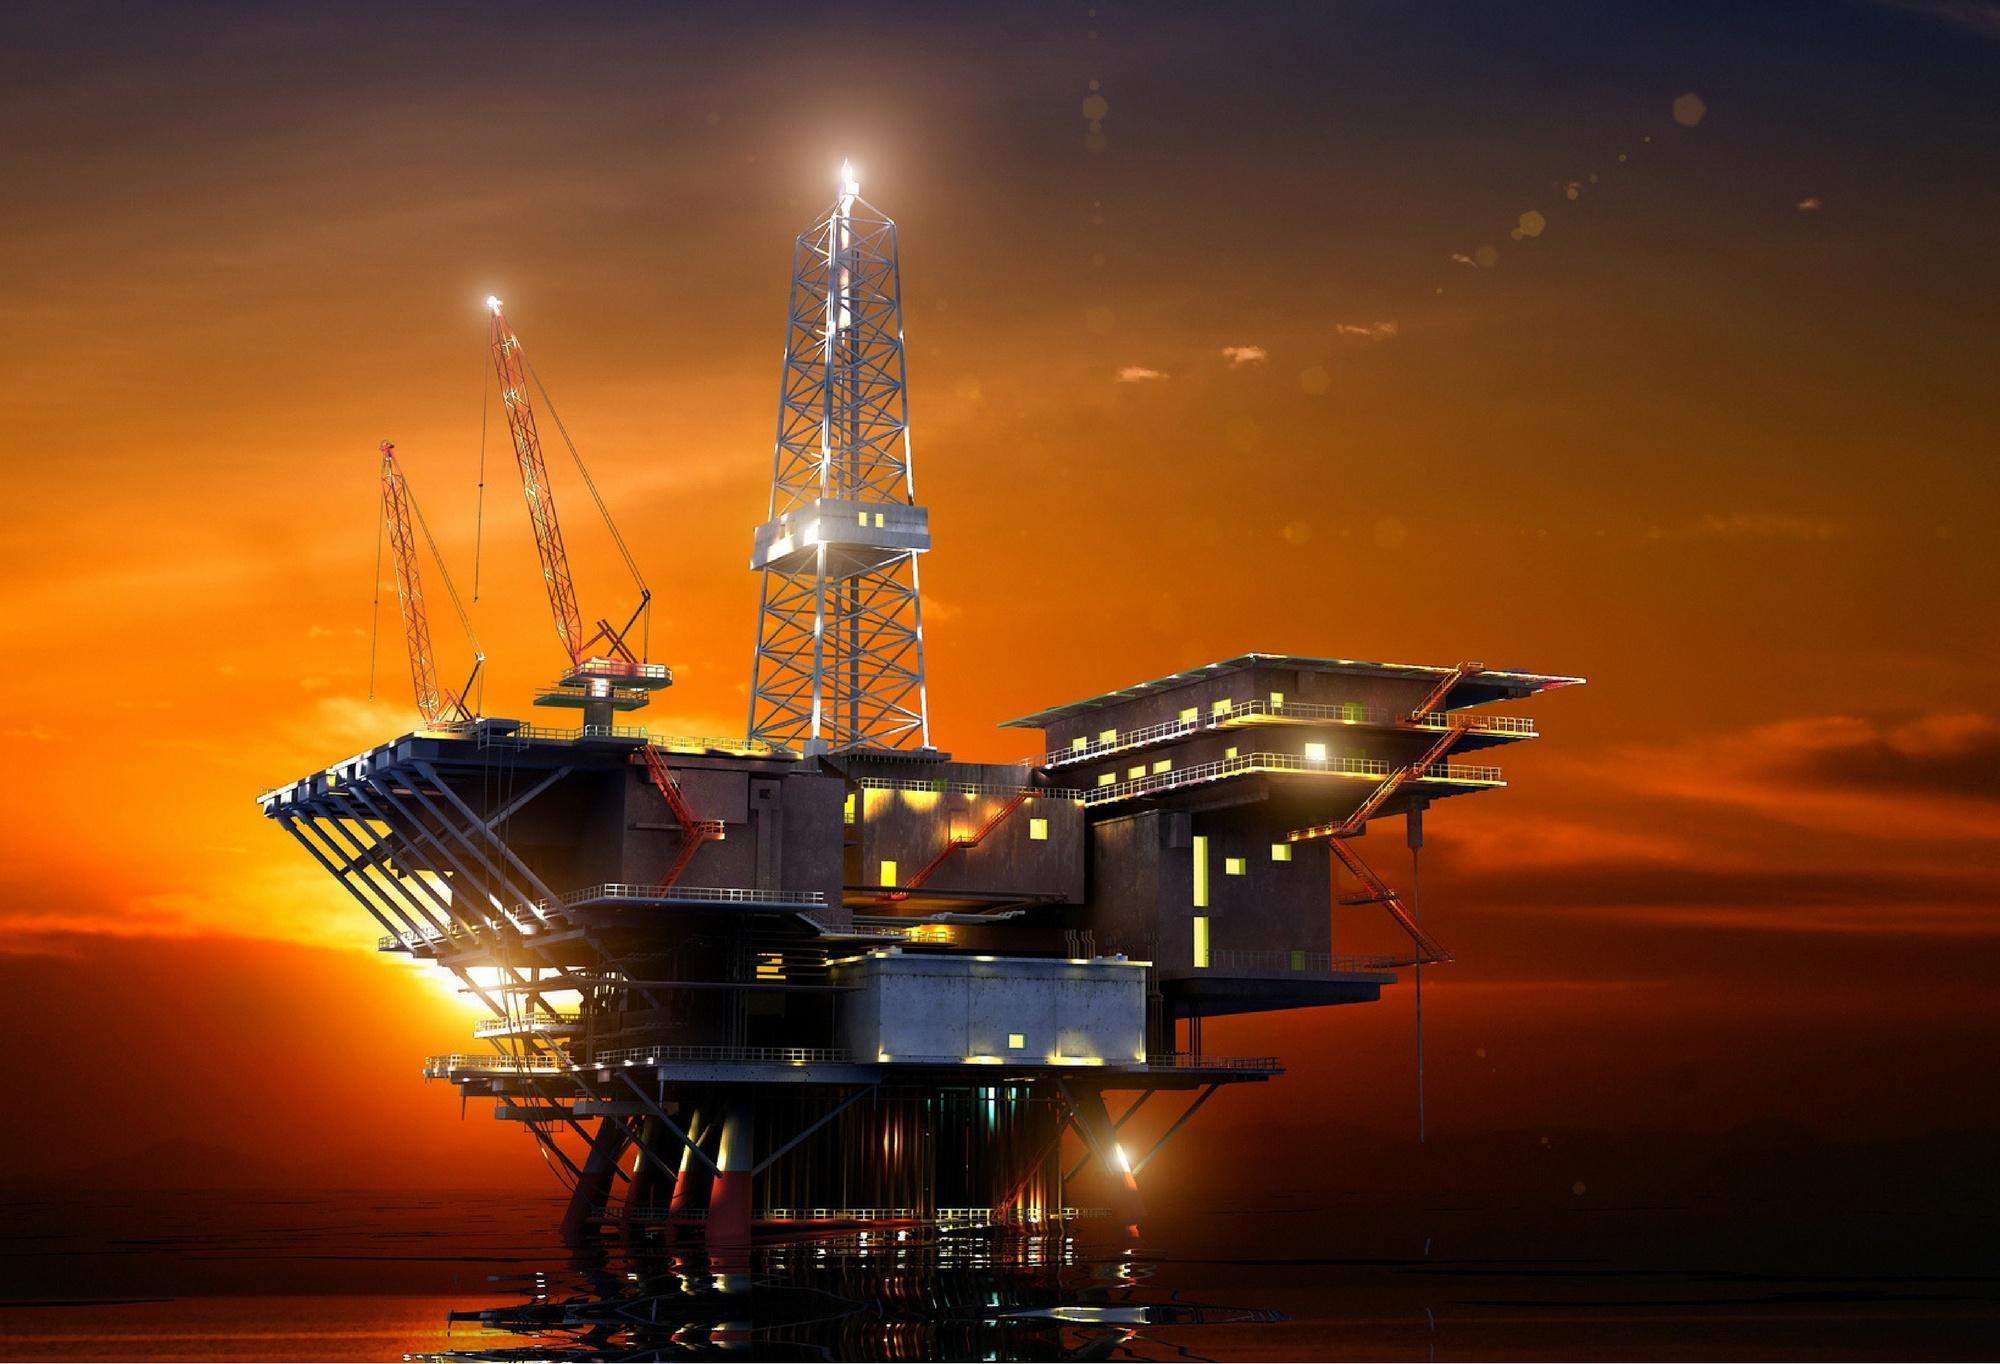 oil gas petroleum field management service software lubricants technology sector innovation gasoline seas petrochemicals fze saiz john shock services rig